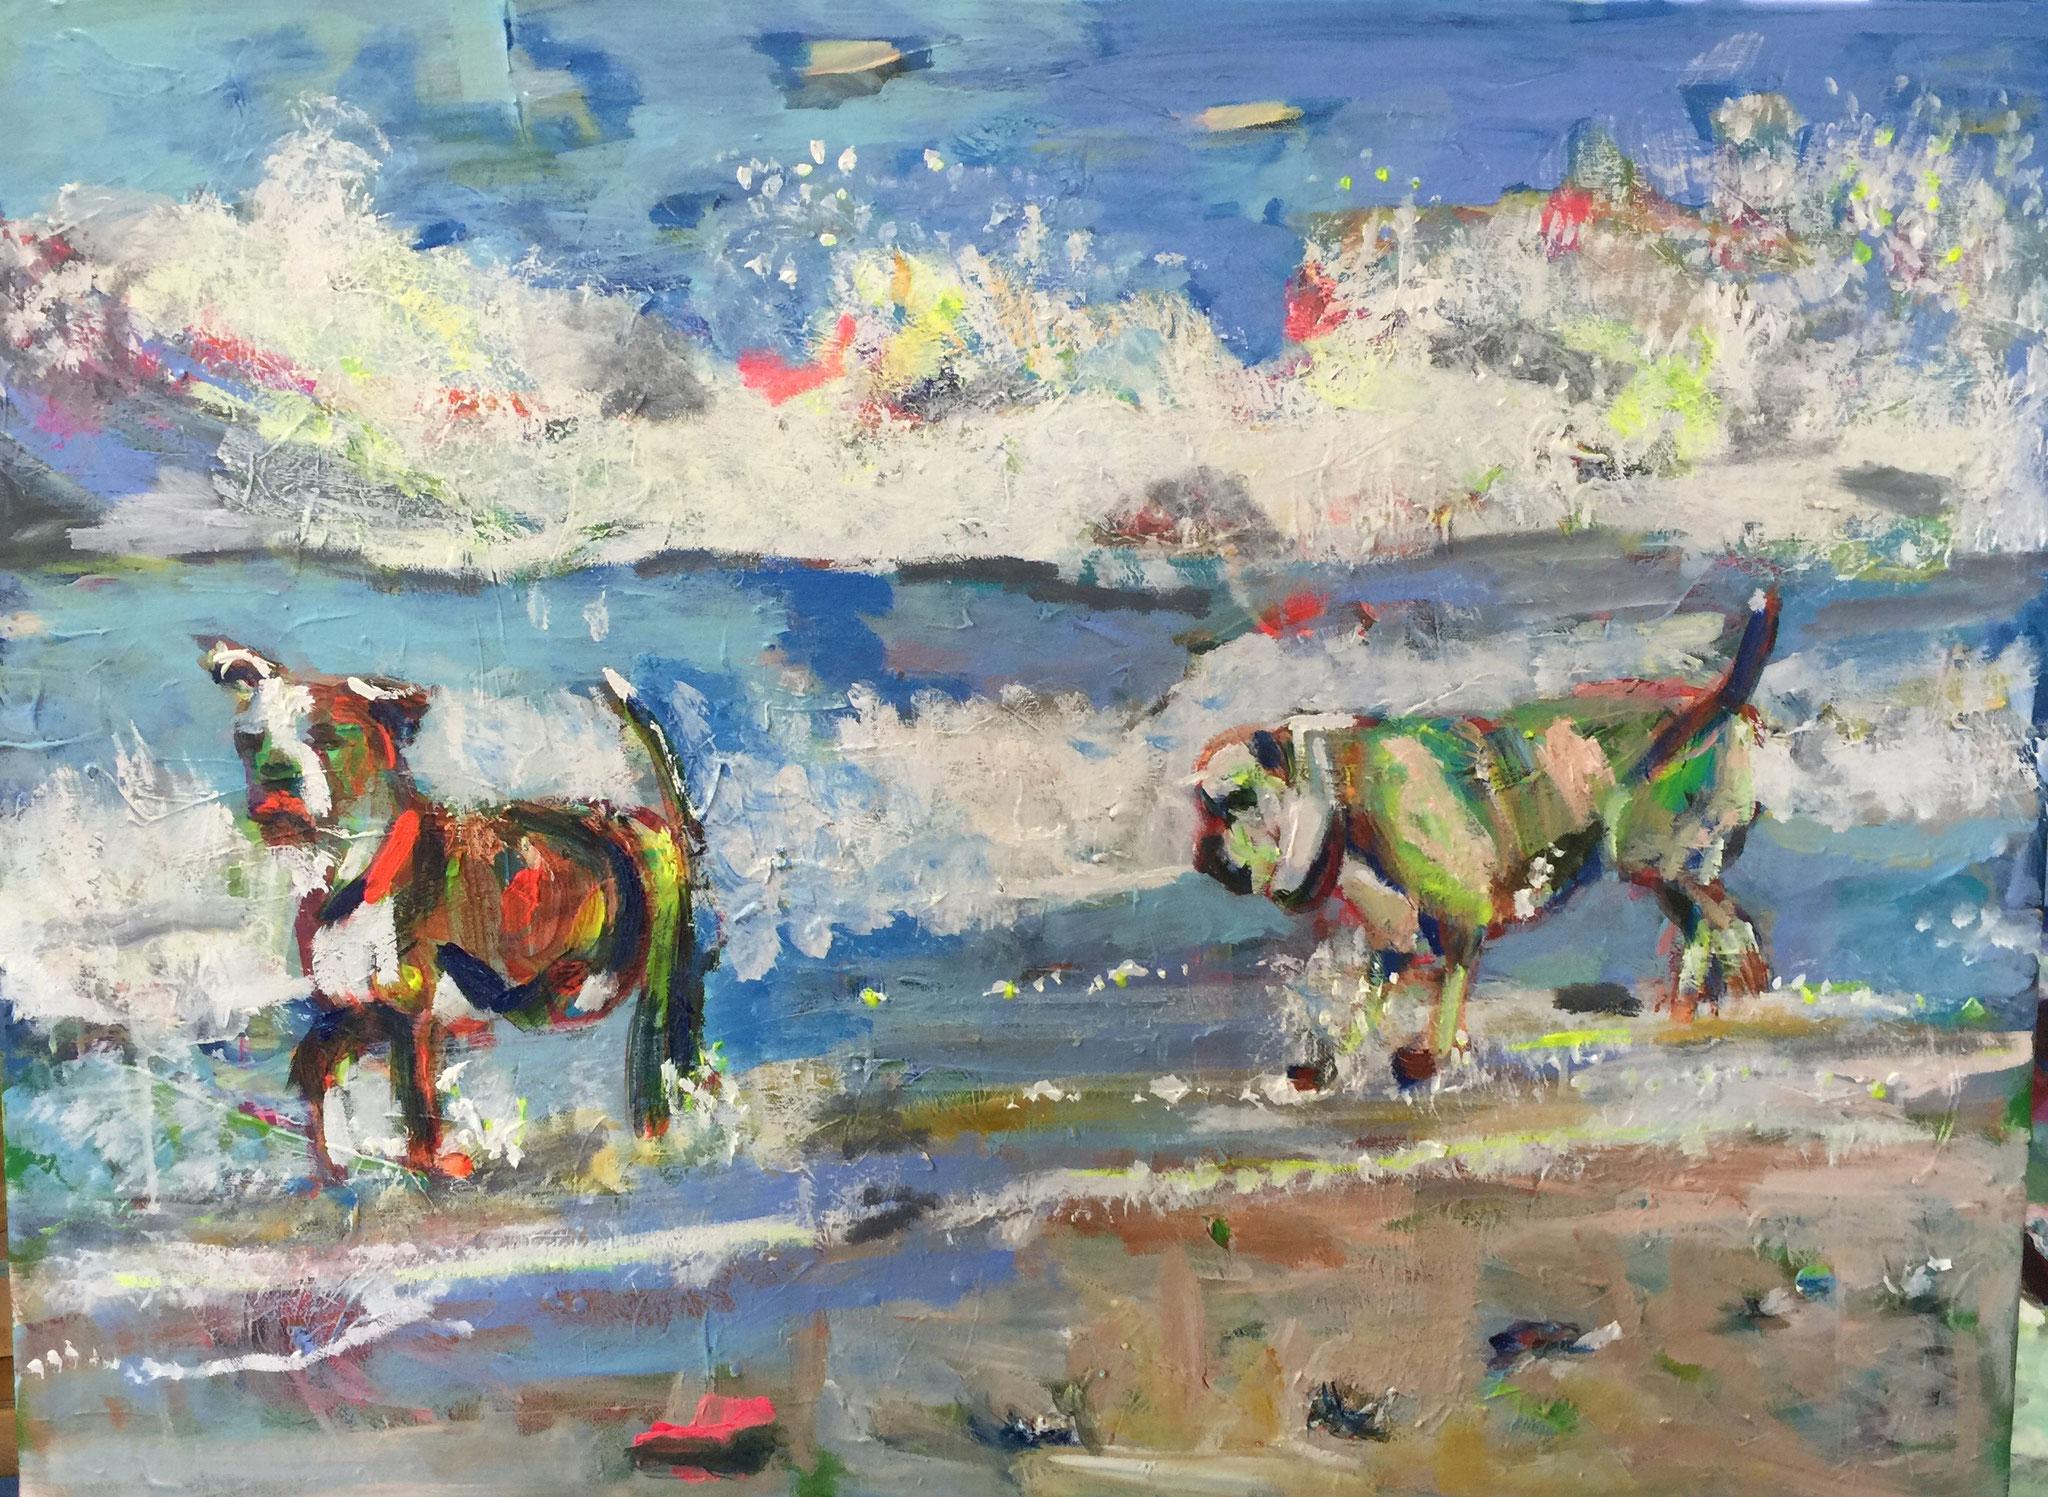 Wasser 3, 60x80 acrylic on canvas